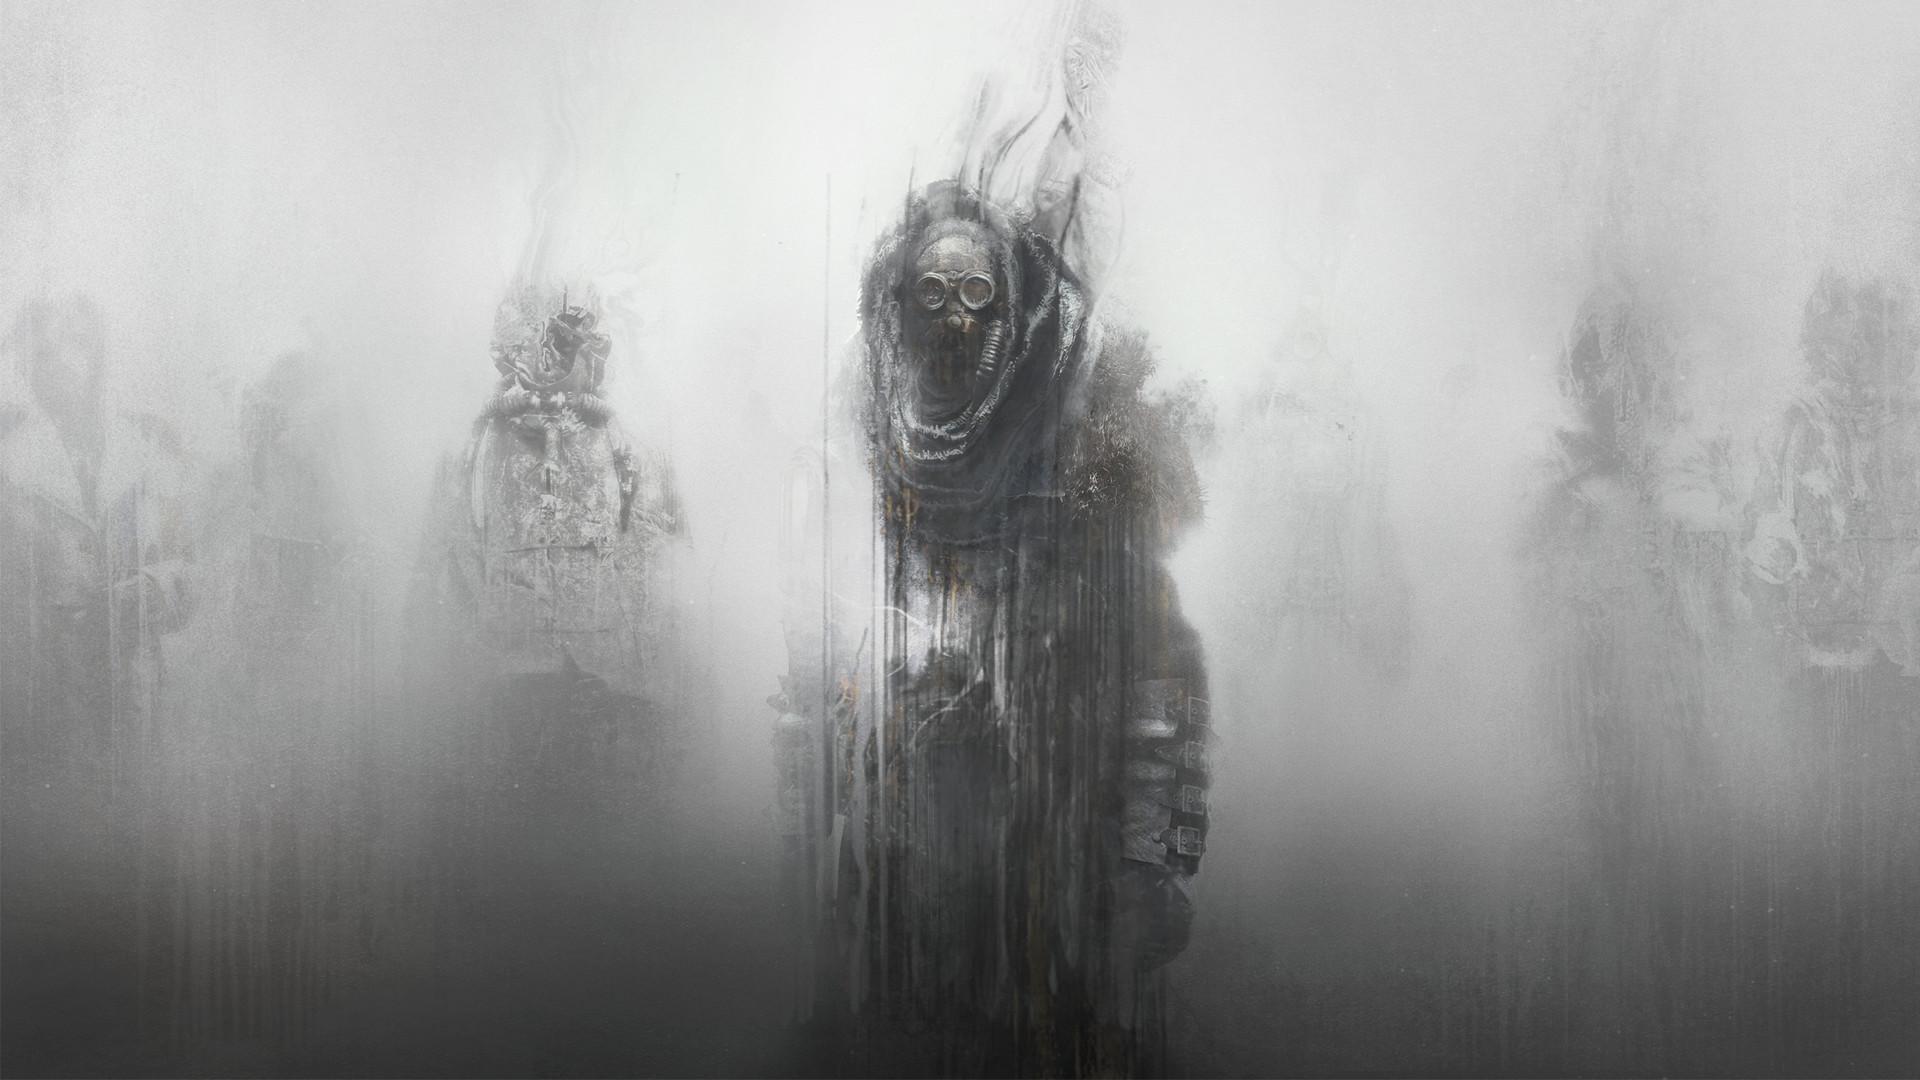 pre-order frostpunk 2 game key online